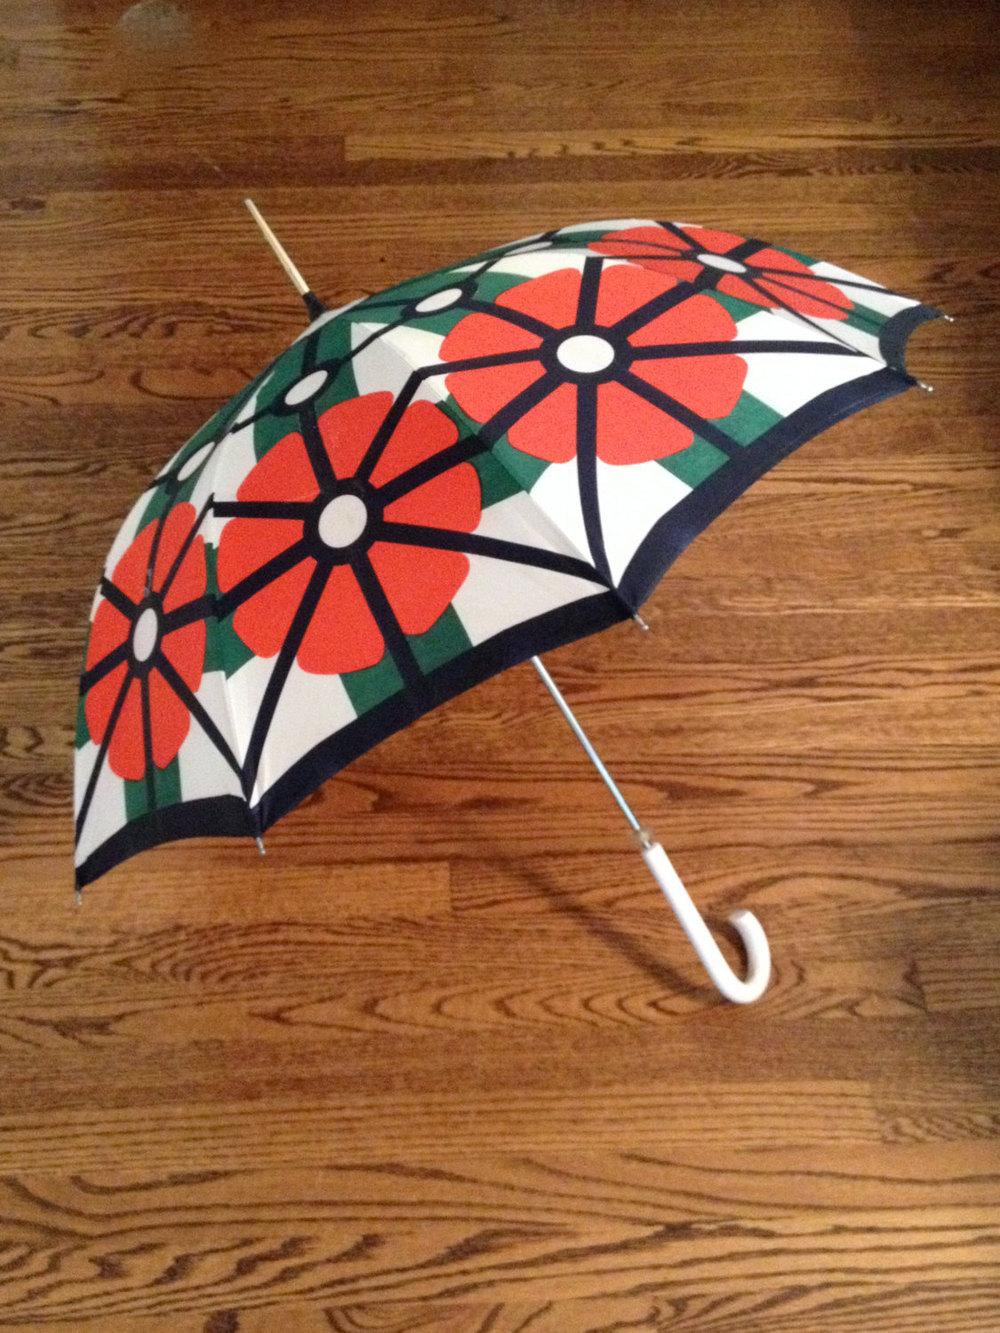 1960s Parisian Lanvin Umbrella from1006 Osage | Keeper & Co. Blog